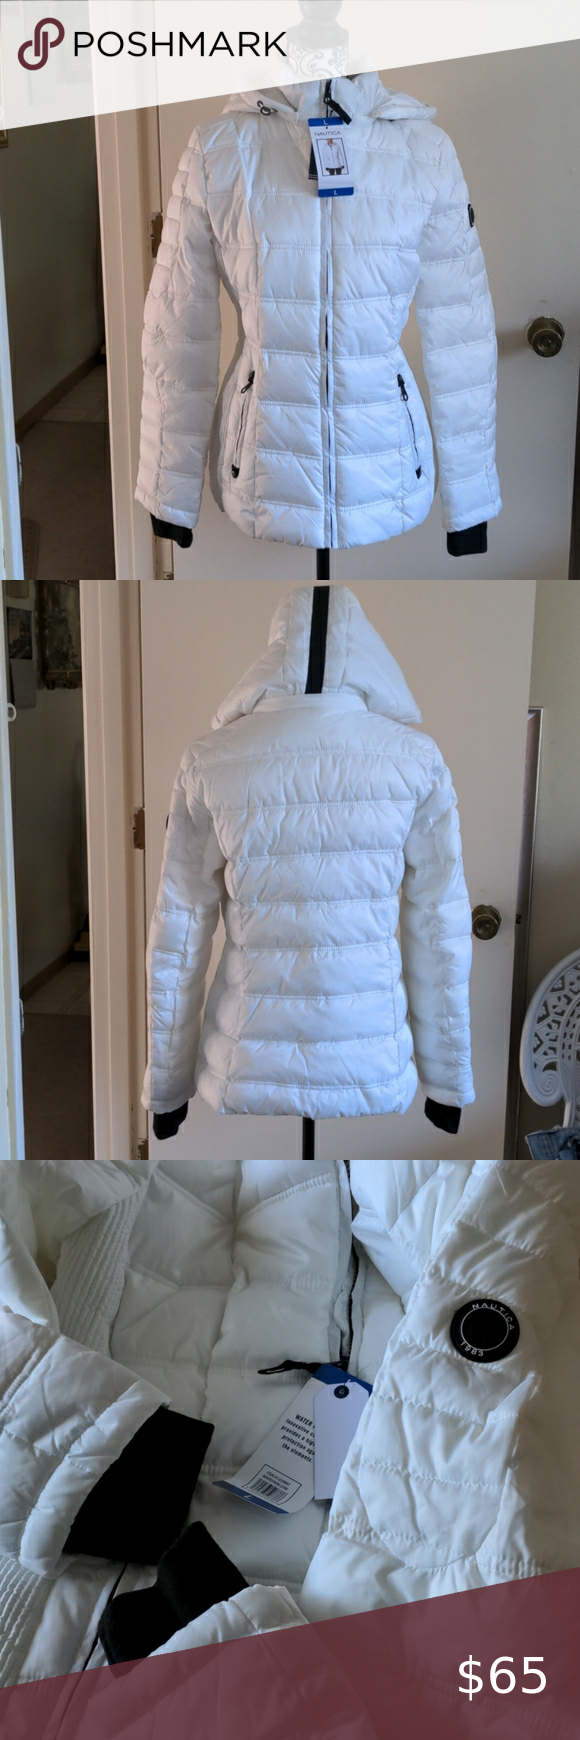 Nautica Water Resistant Size L Puffer Jacket Women Coats Jackets Women Reversible Puffer Vest [ 1740 x 580 Pixel ]